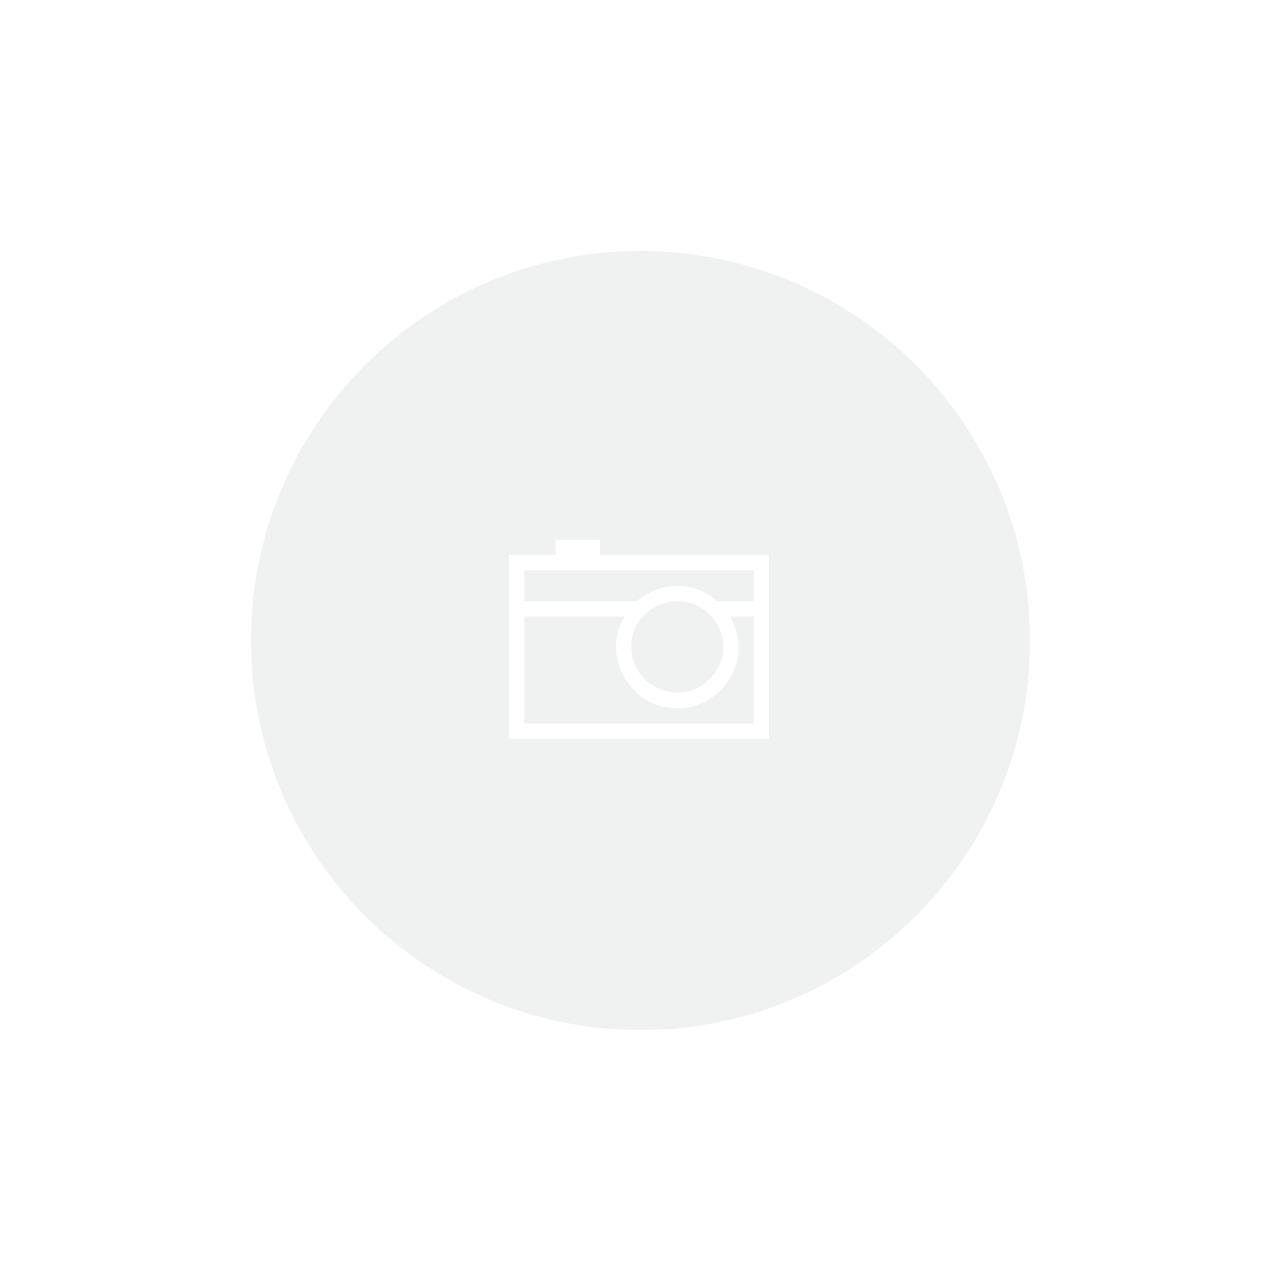 Colcha Solteiro in Design Franja cor Branco